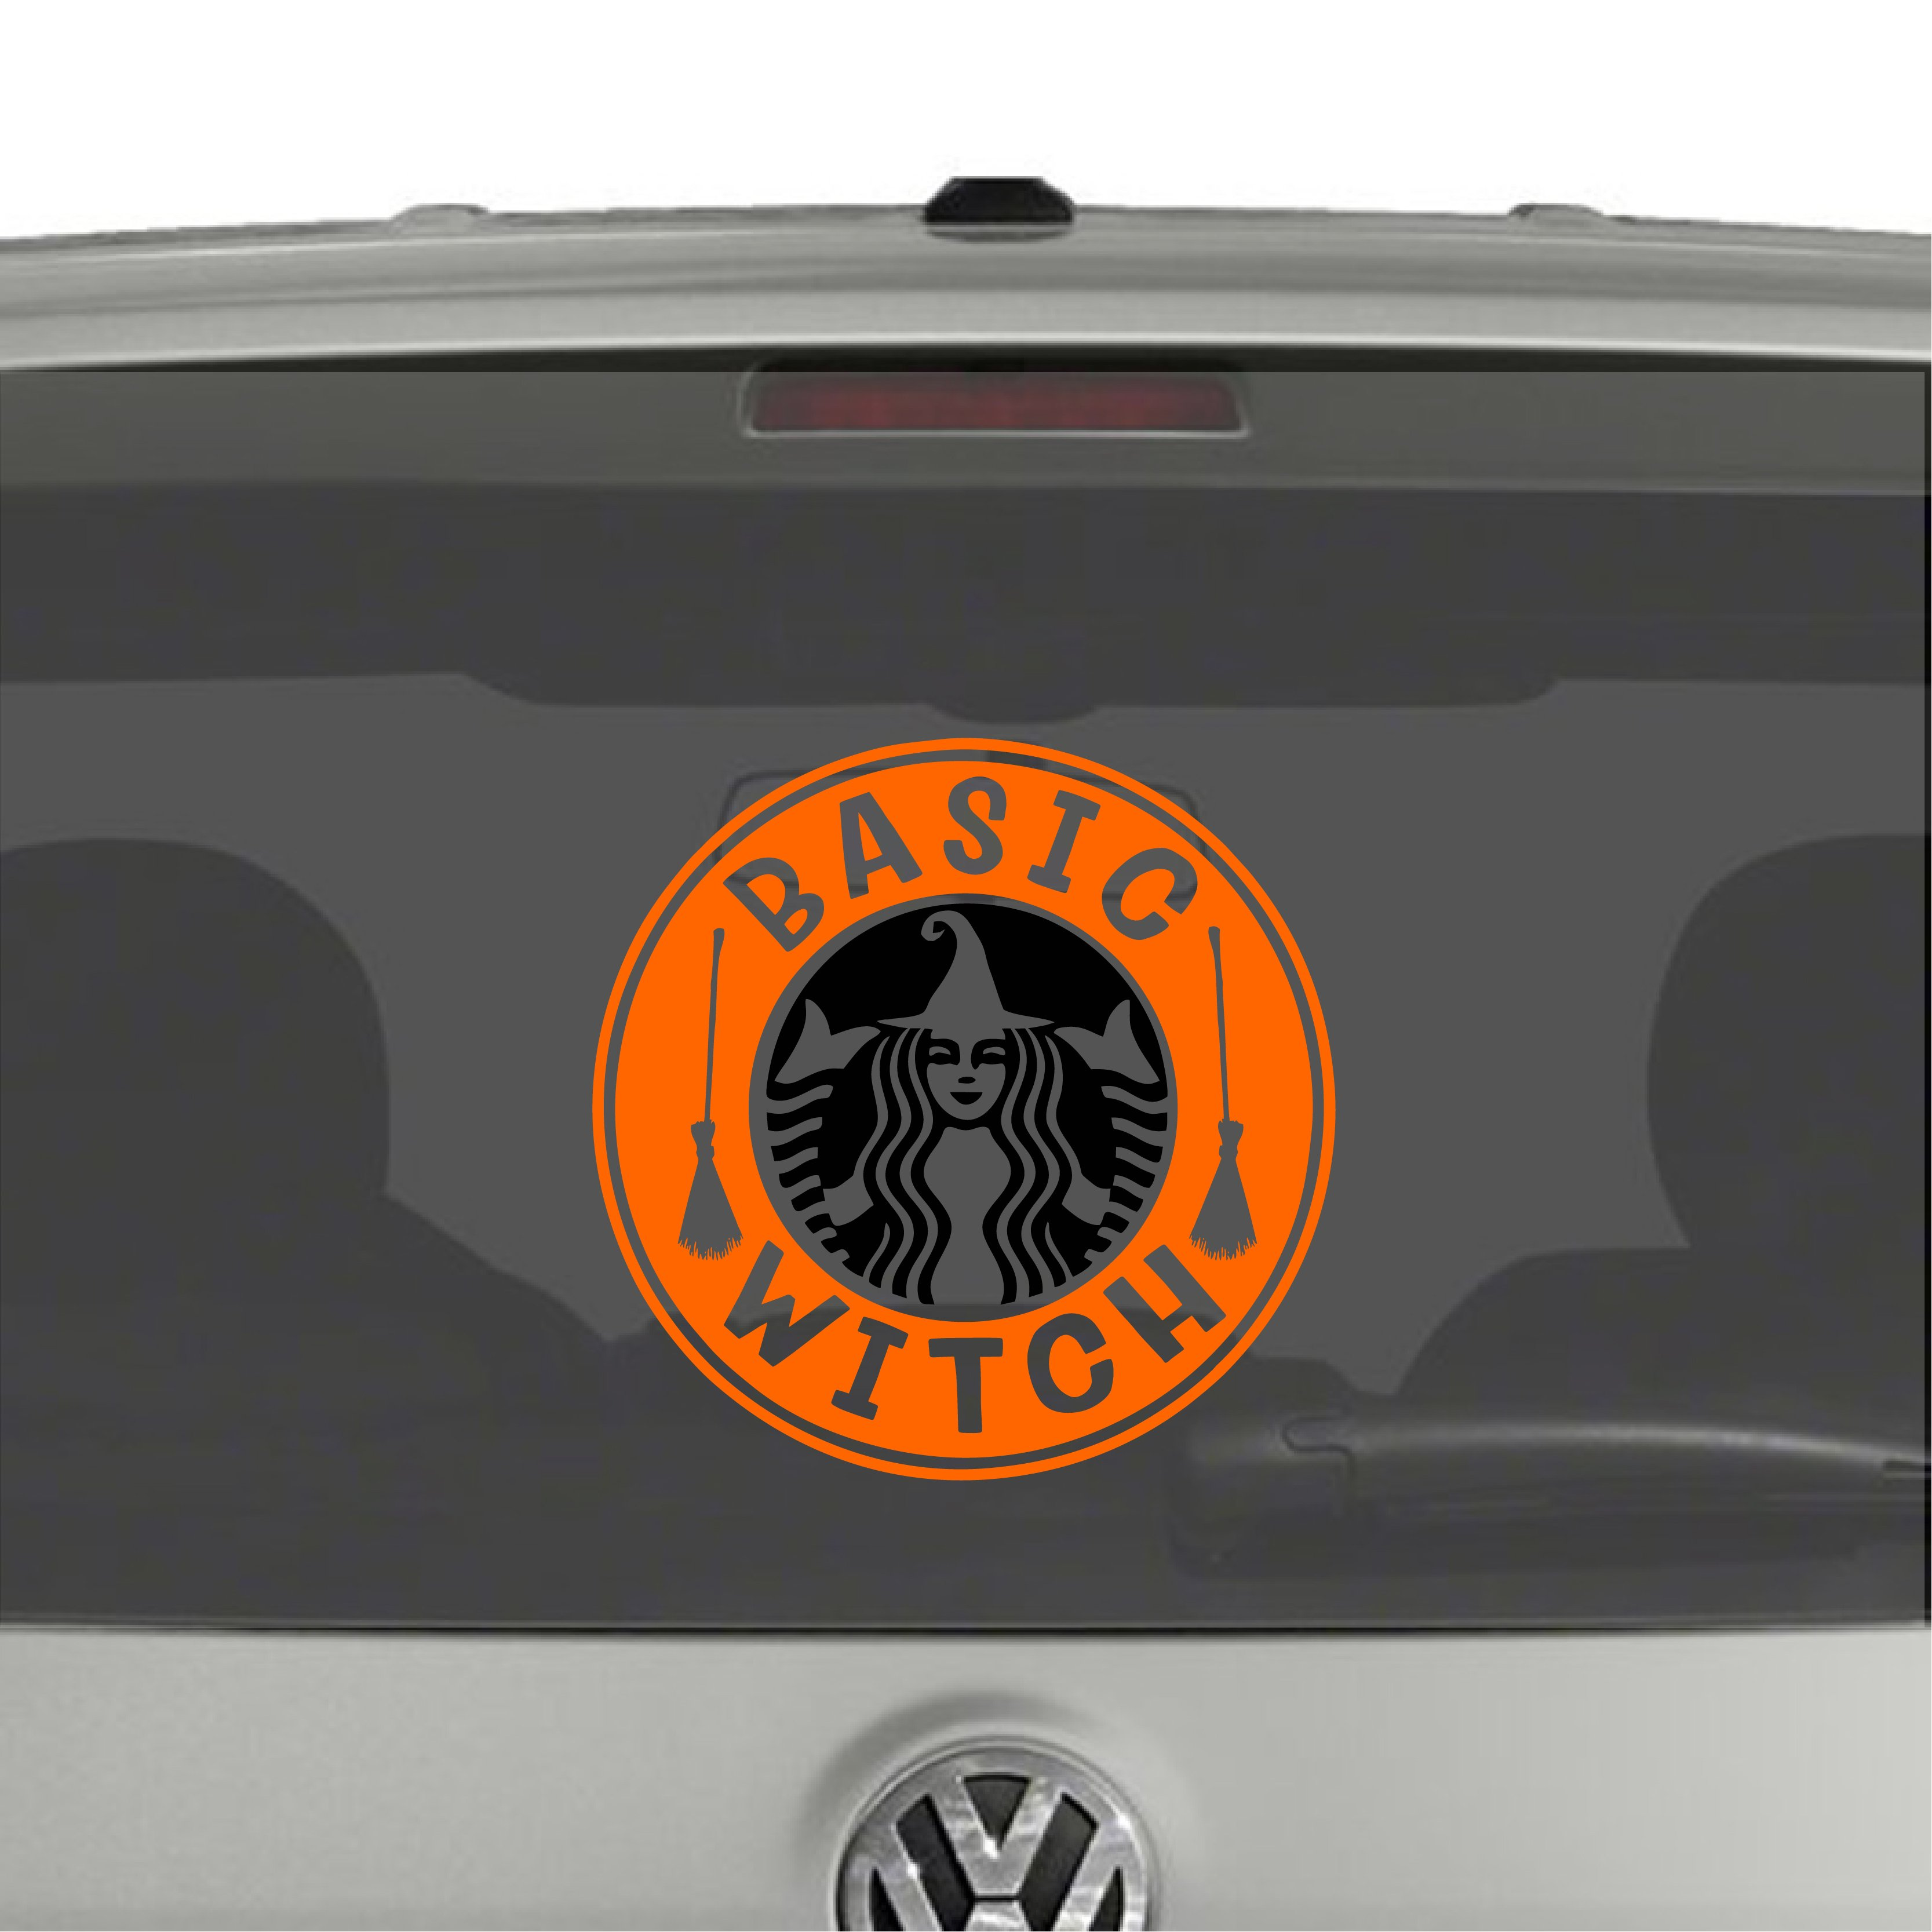 Basic Witch Starbucks Parody Vinyl Decal Sticker